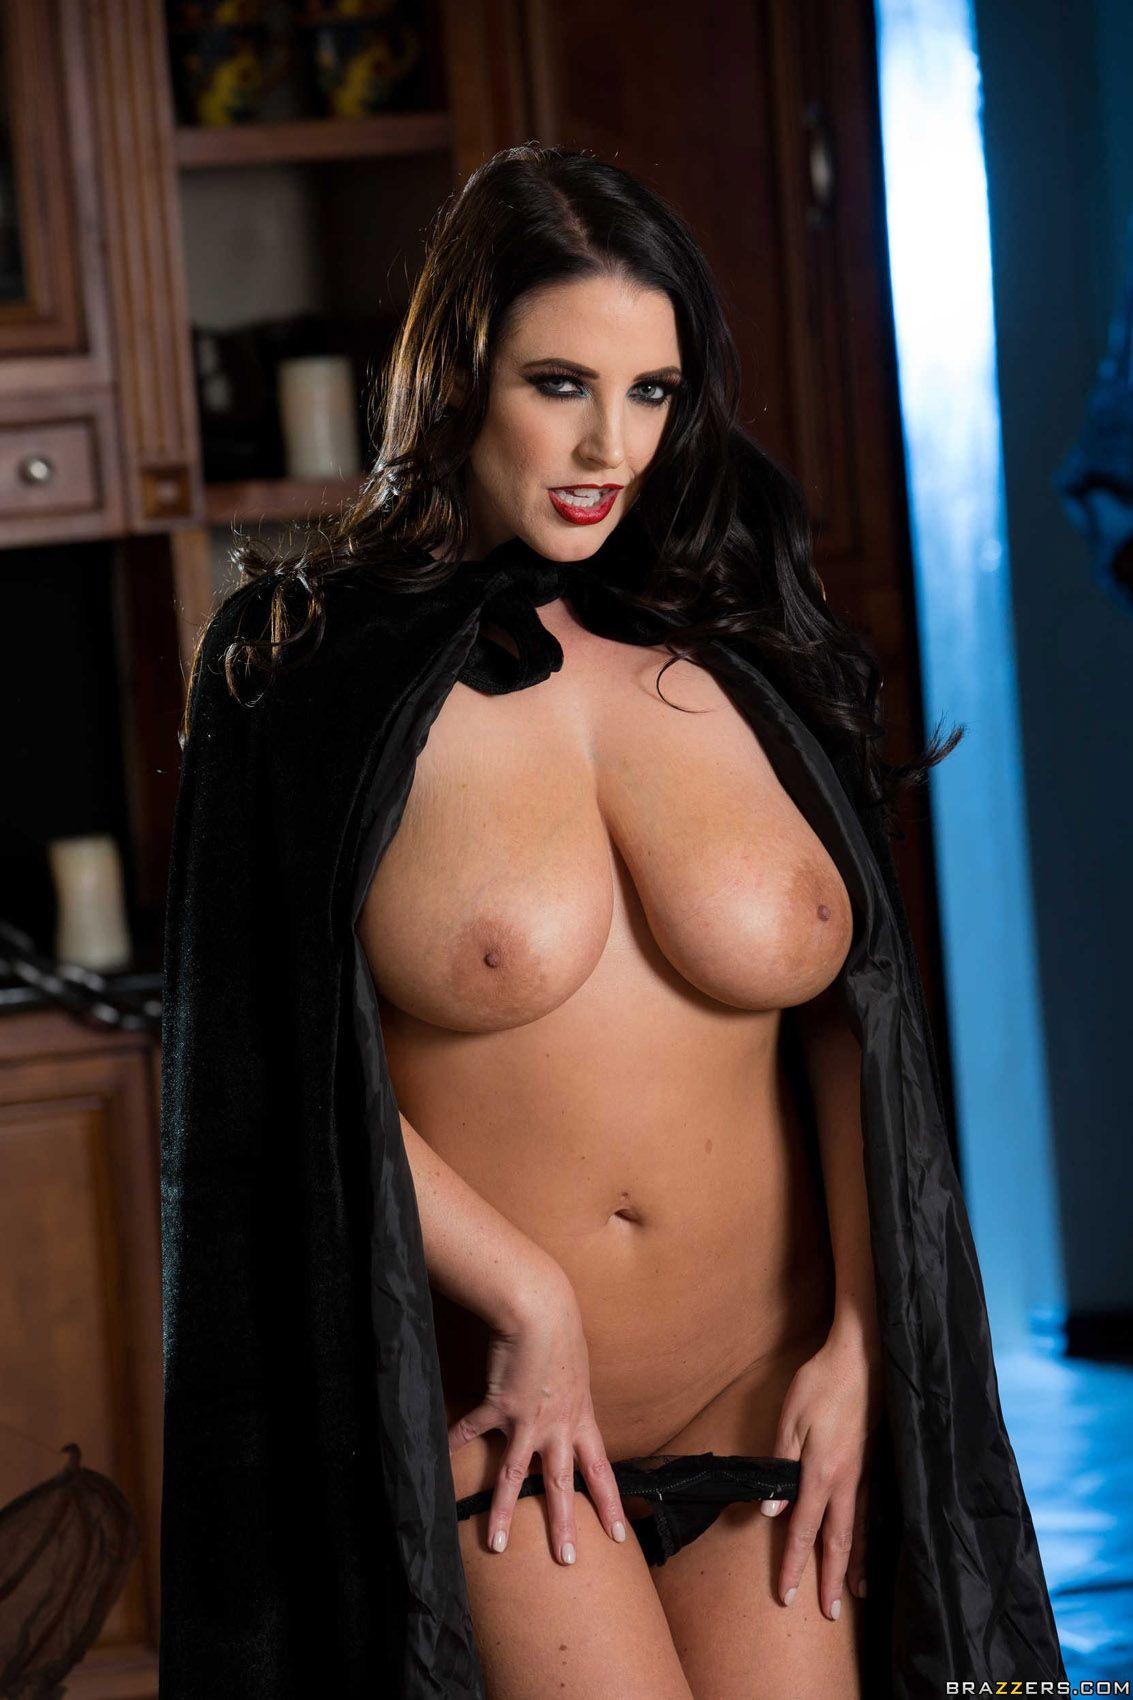 angela white sexy huge boobs photos (6) | sexy | pinterest | boobs